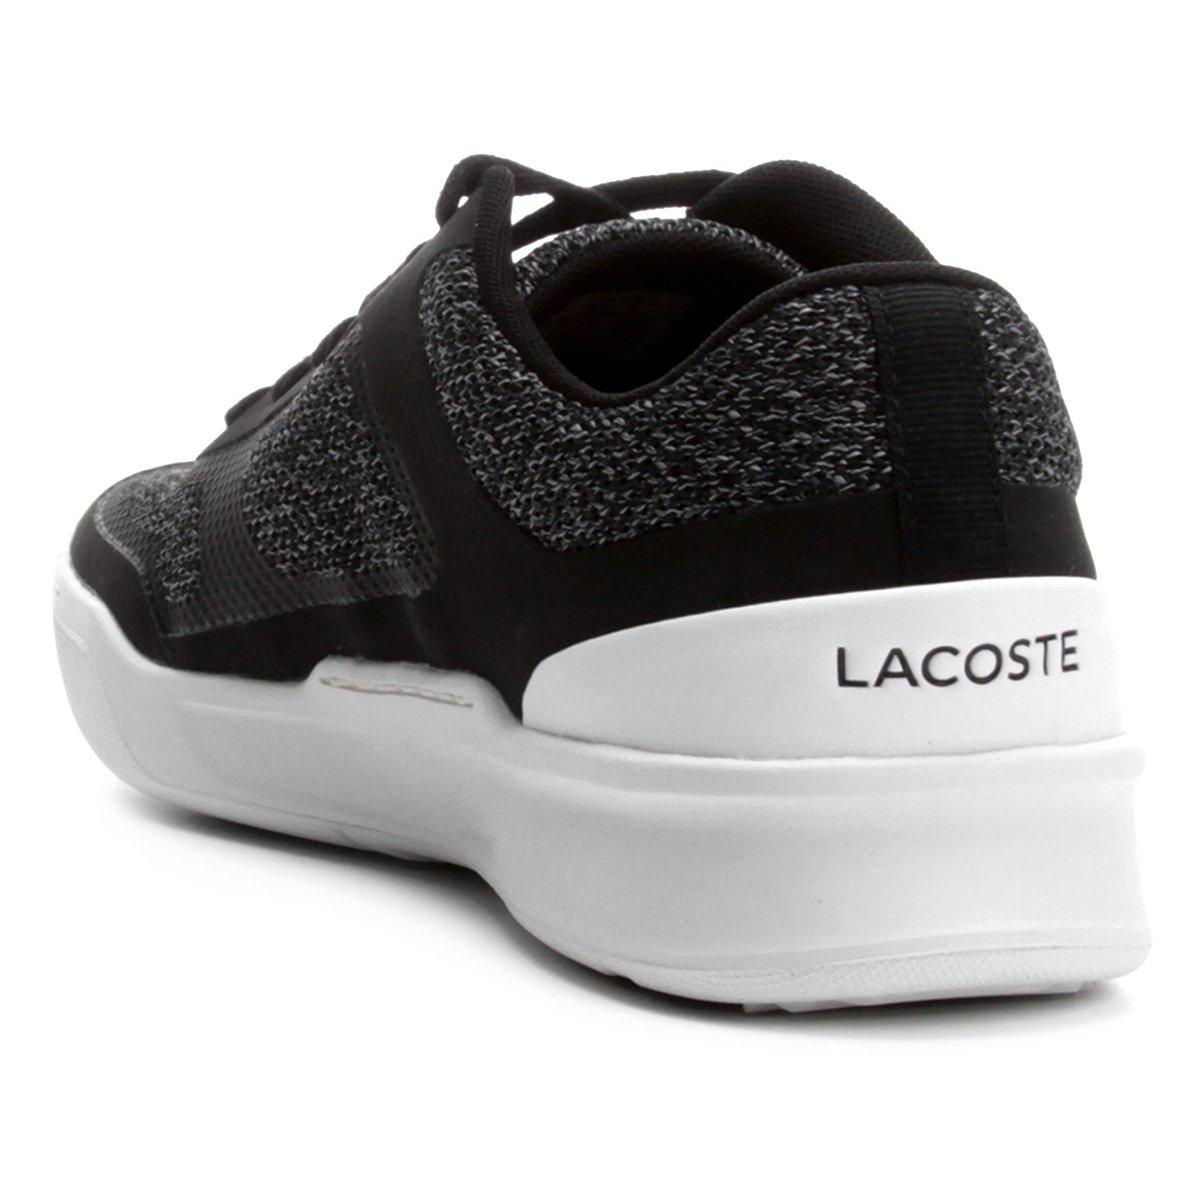 Tênis Lacoste Explorateur Masculino - Compre Agora   Netshoes 7a055ccbef